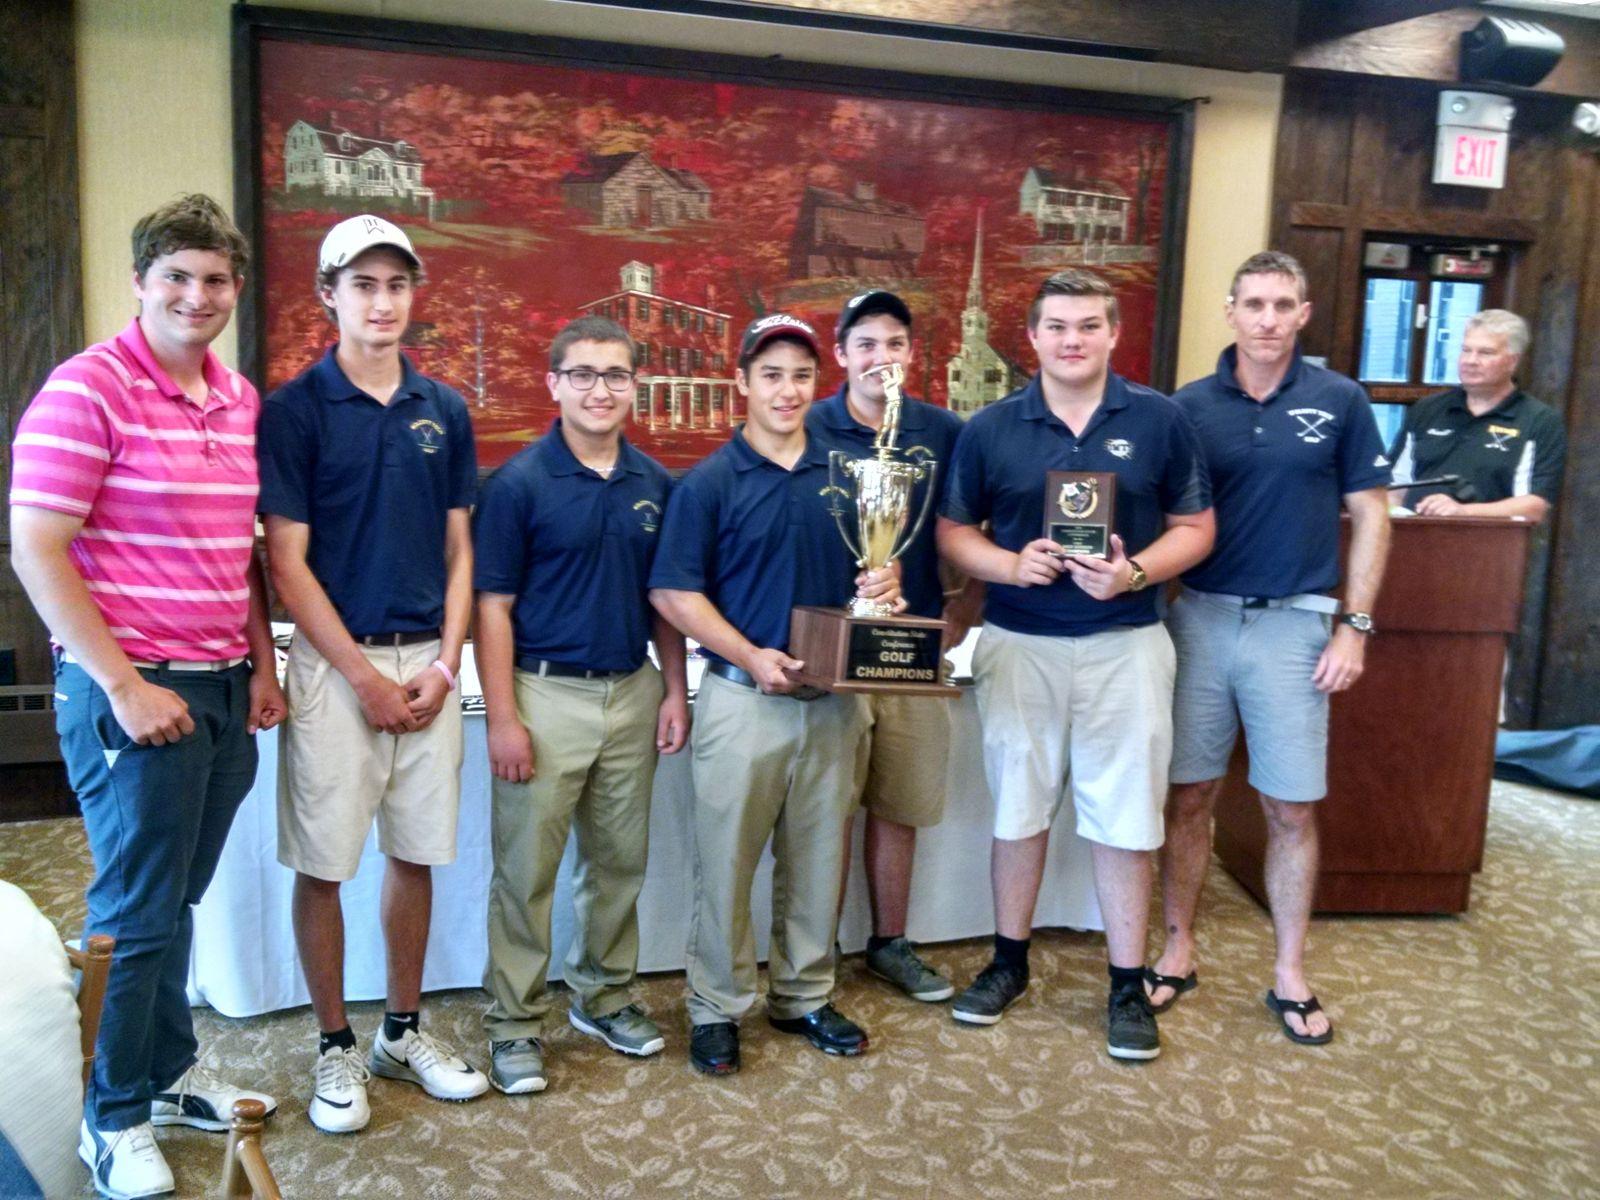 CSC golf Champs 2016